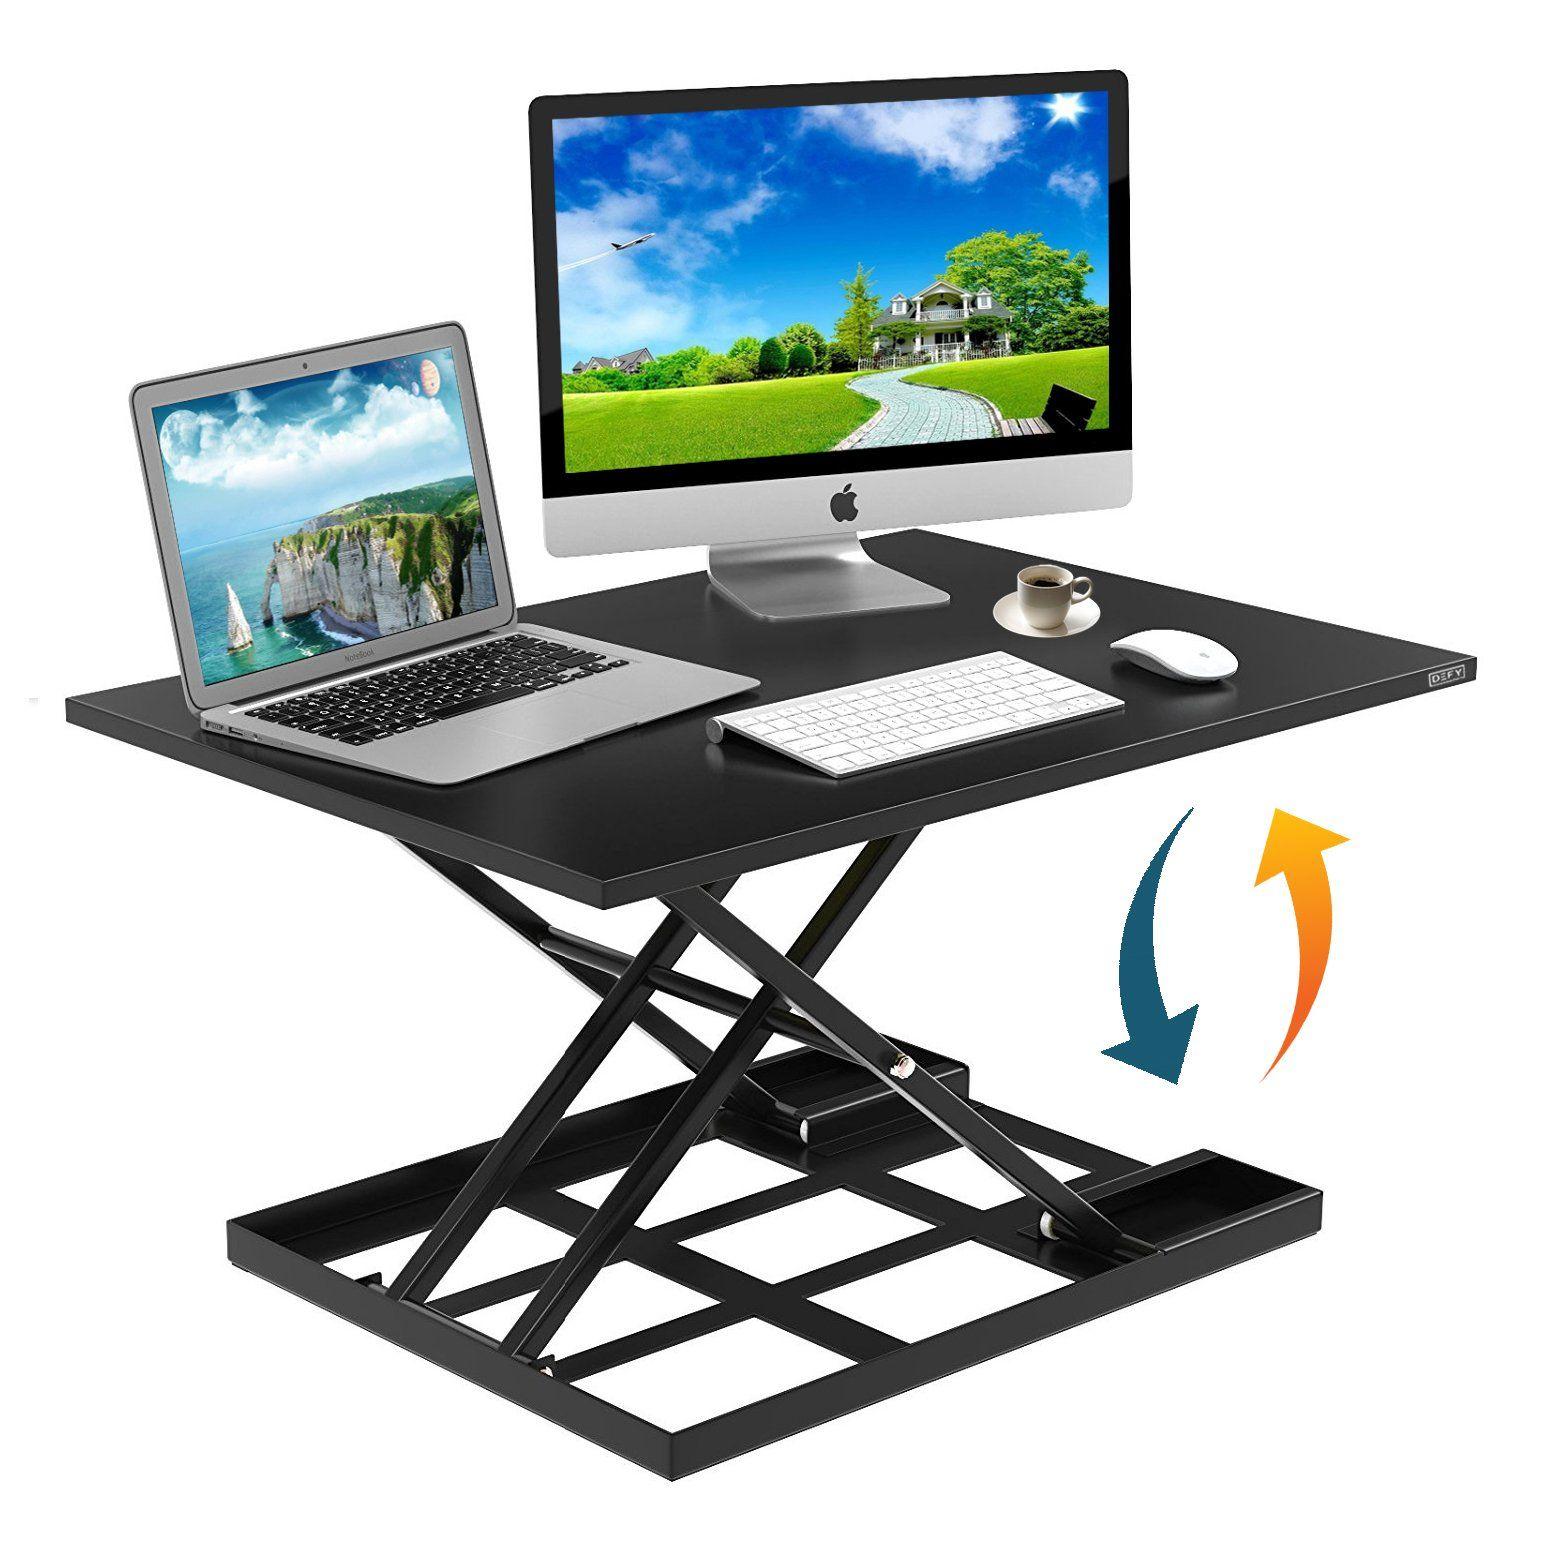 Height Adjustable Standing Desk Converter Ergonomic Sit Stand Black Riser  Large Top Size 32 X 22u201d Inch Gas Spring Workstation Anti Fatigue Up U0026 Down  ...